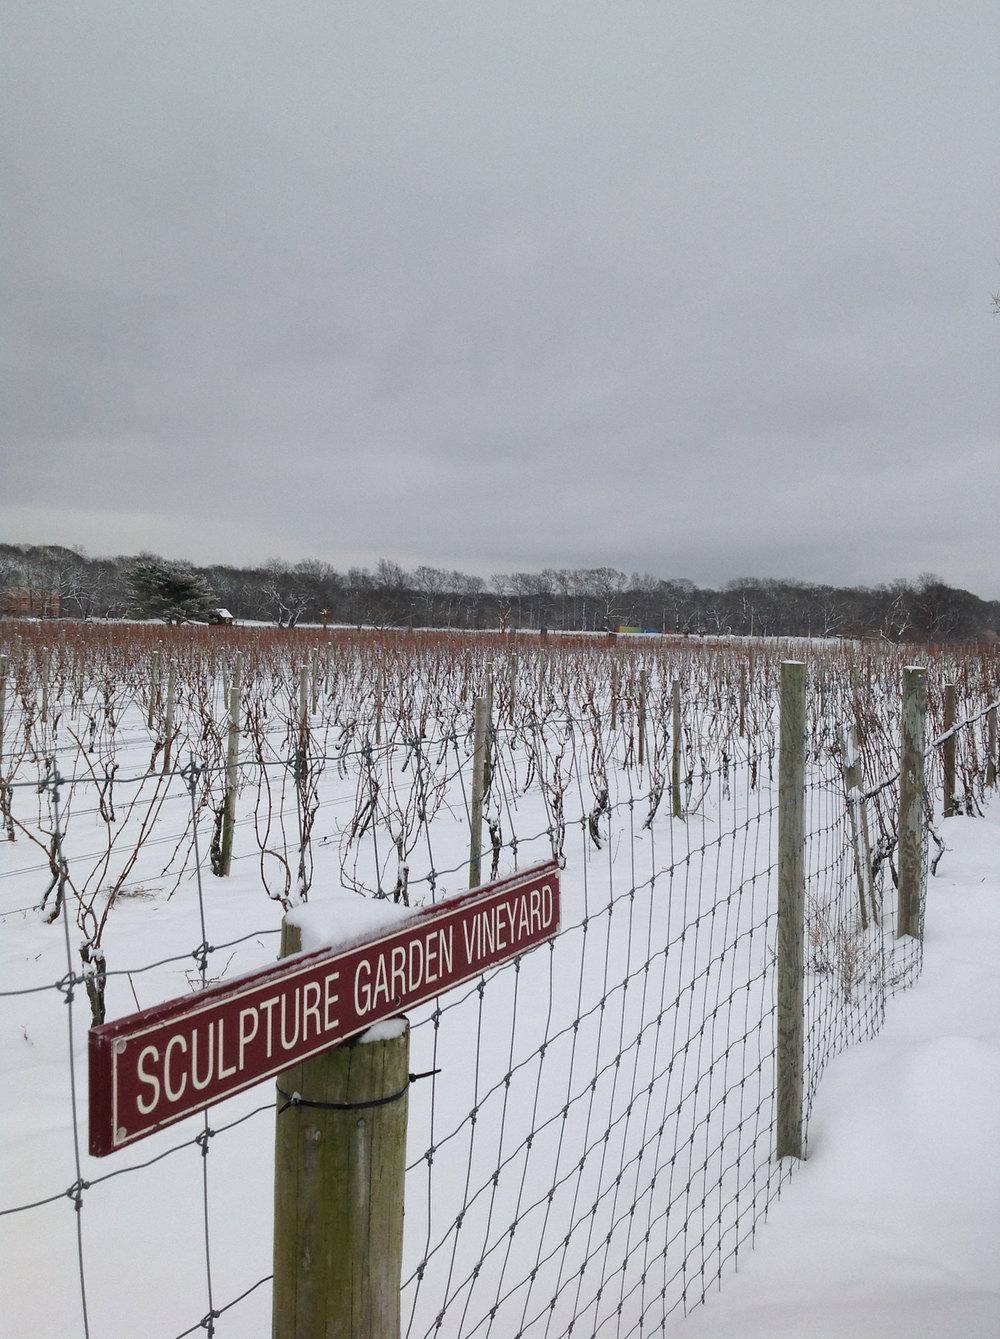 dormant vineyard in winter snow